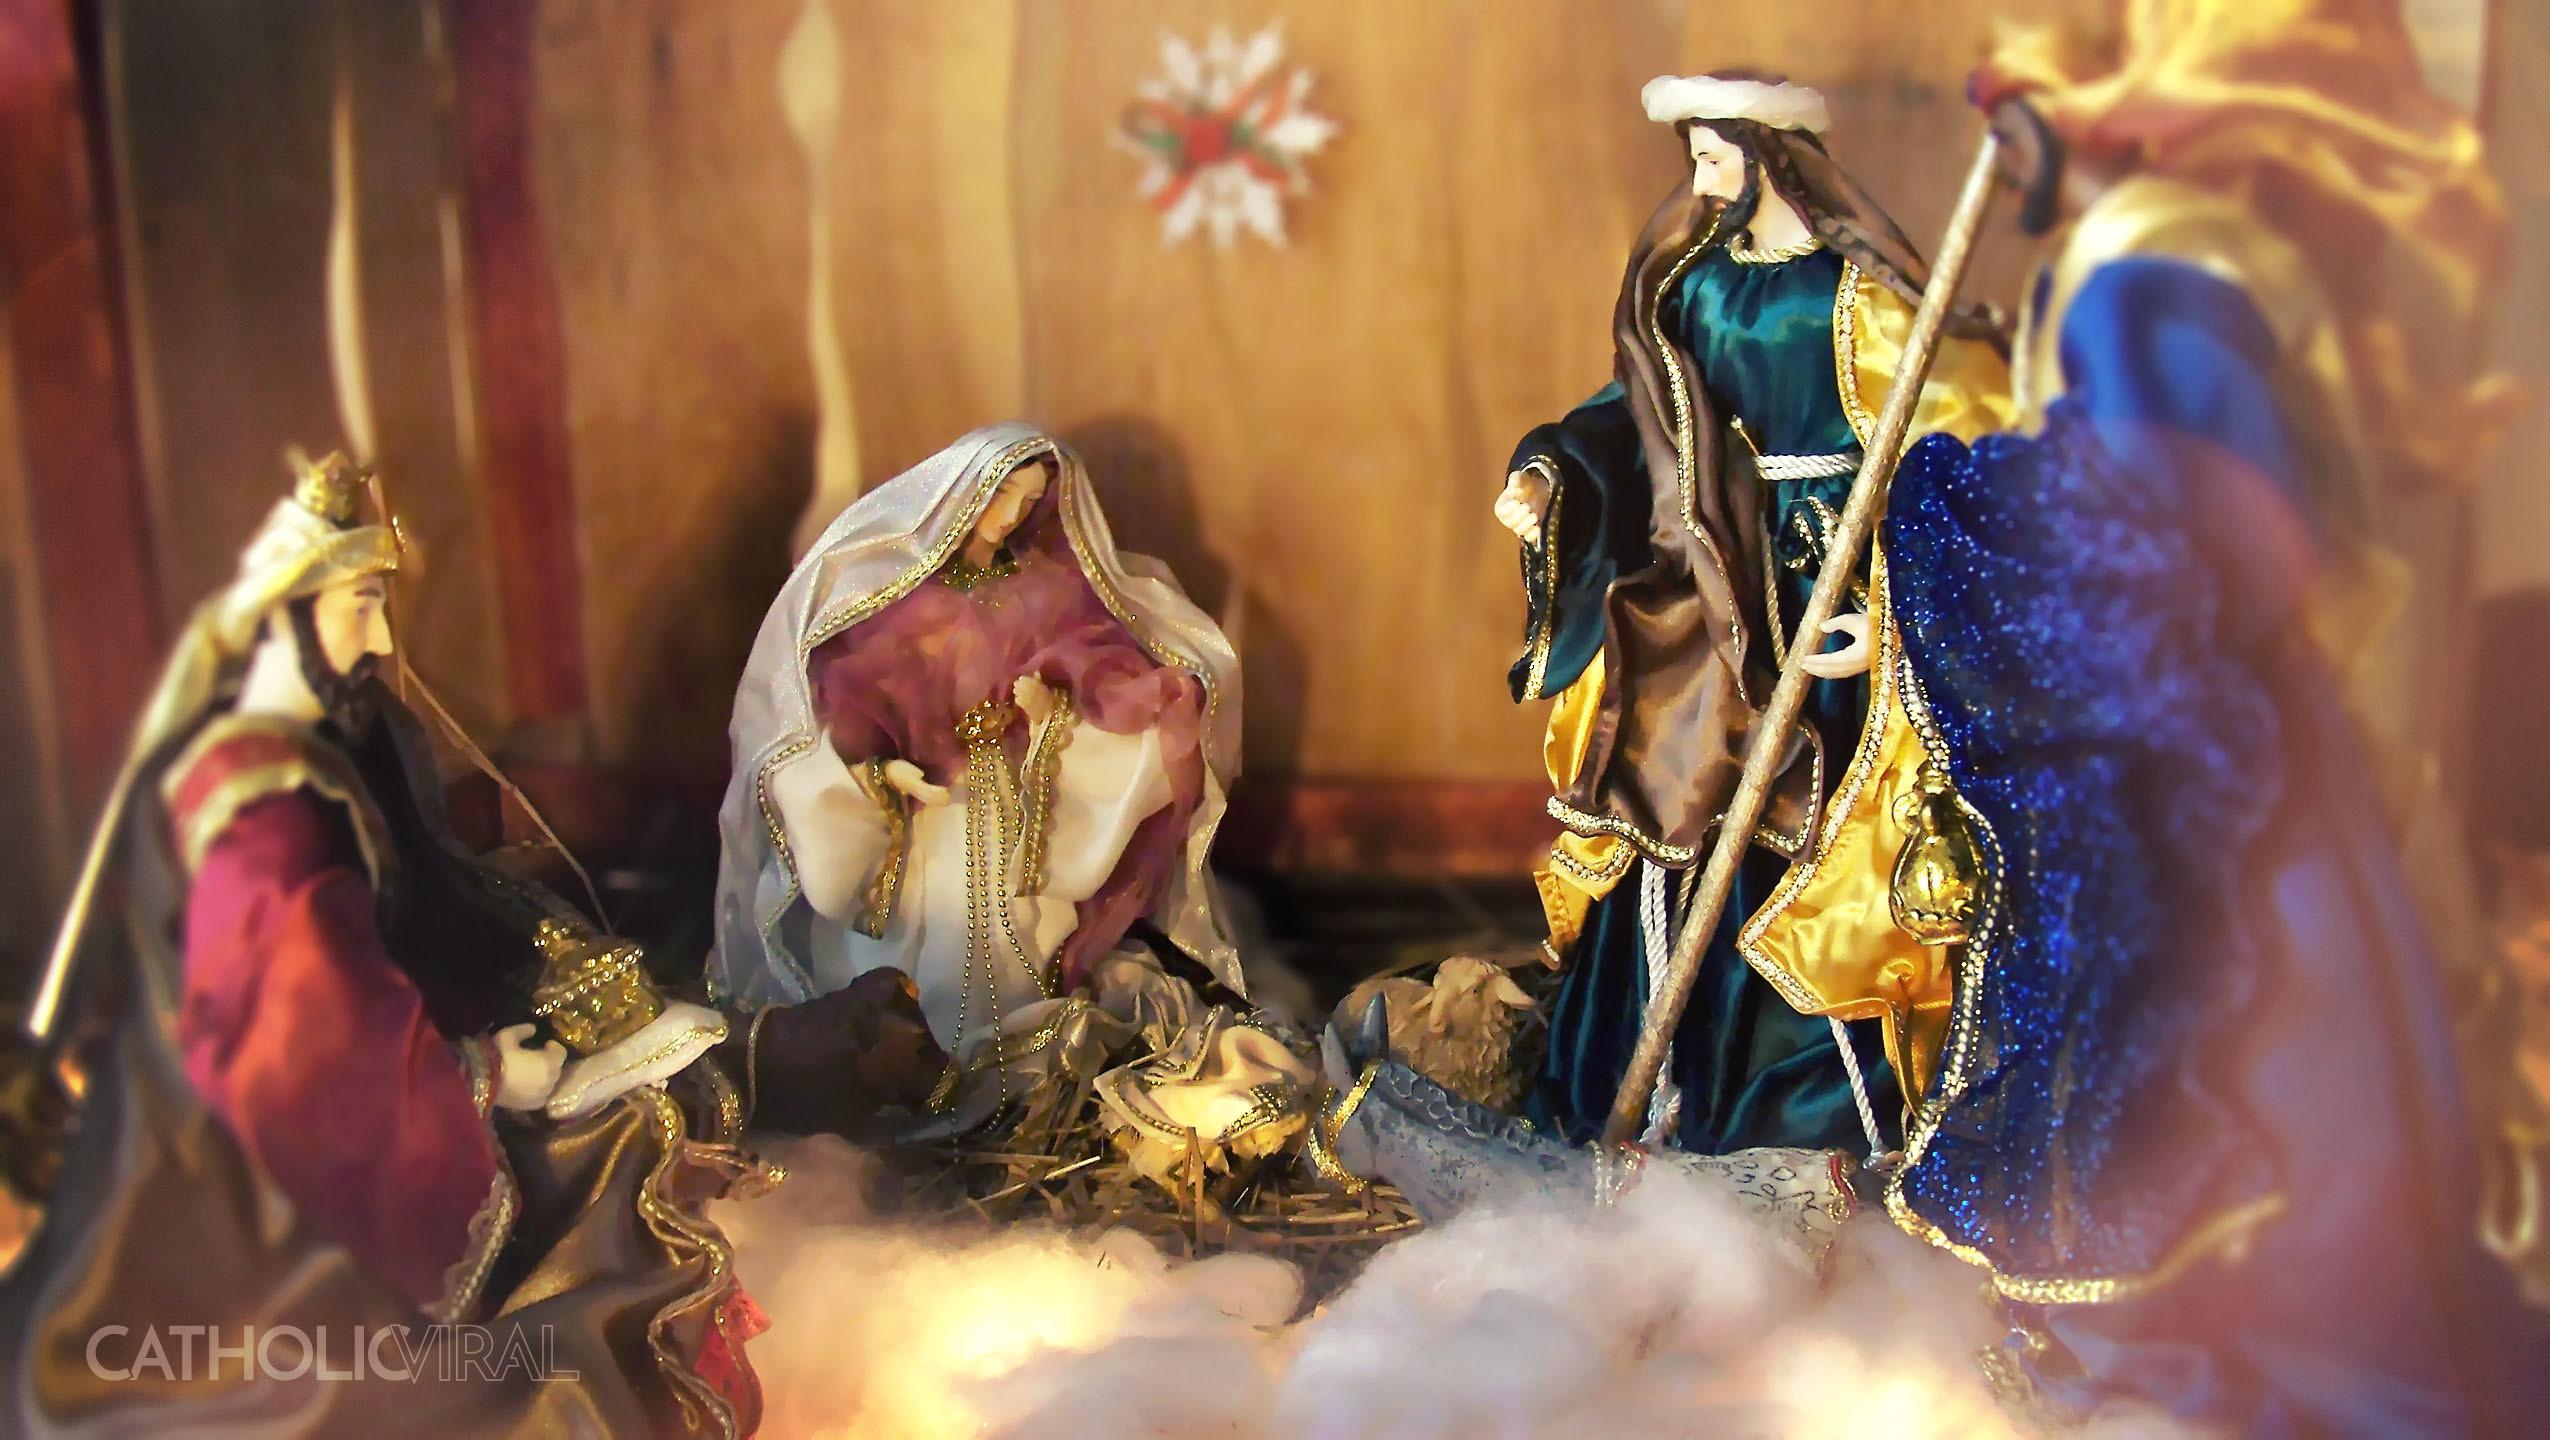 … Christmas Wallpapers – Nativity Creche Scene. Share!